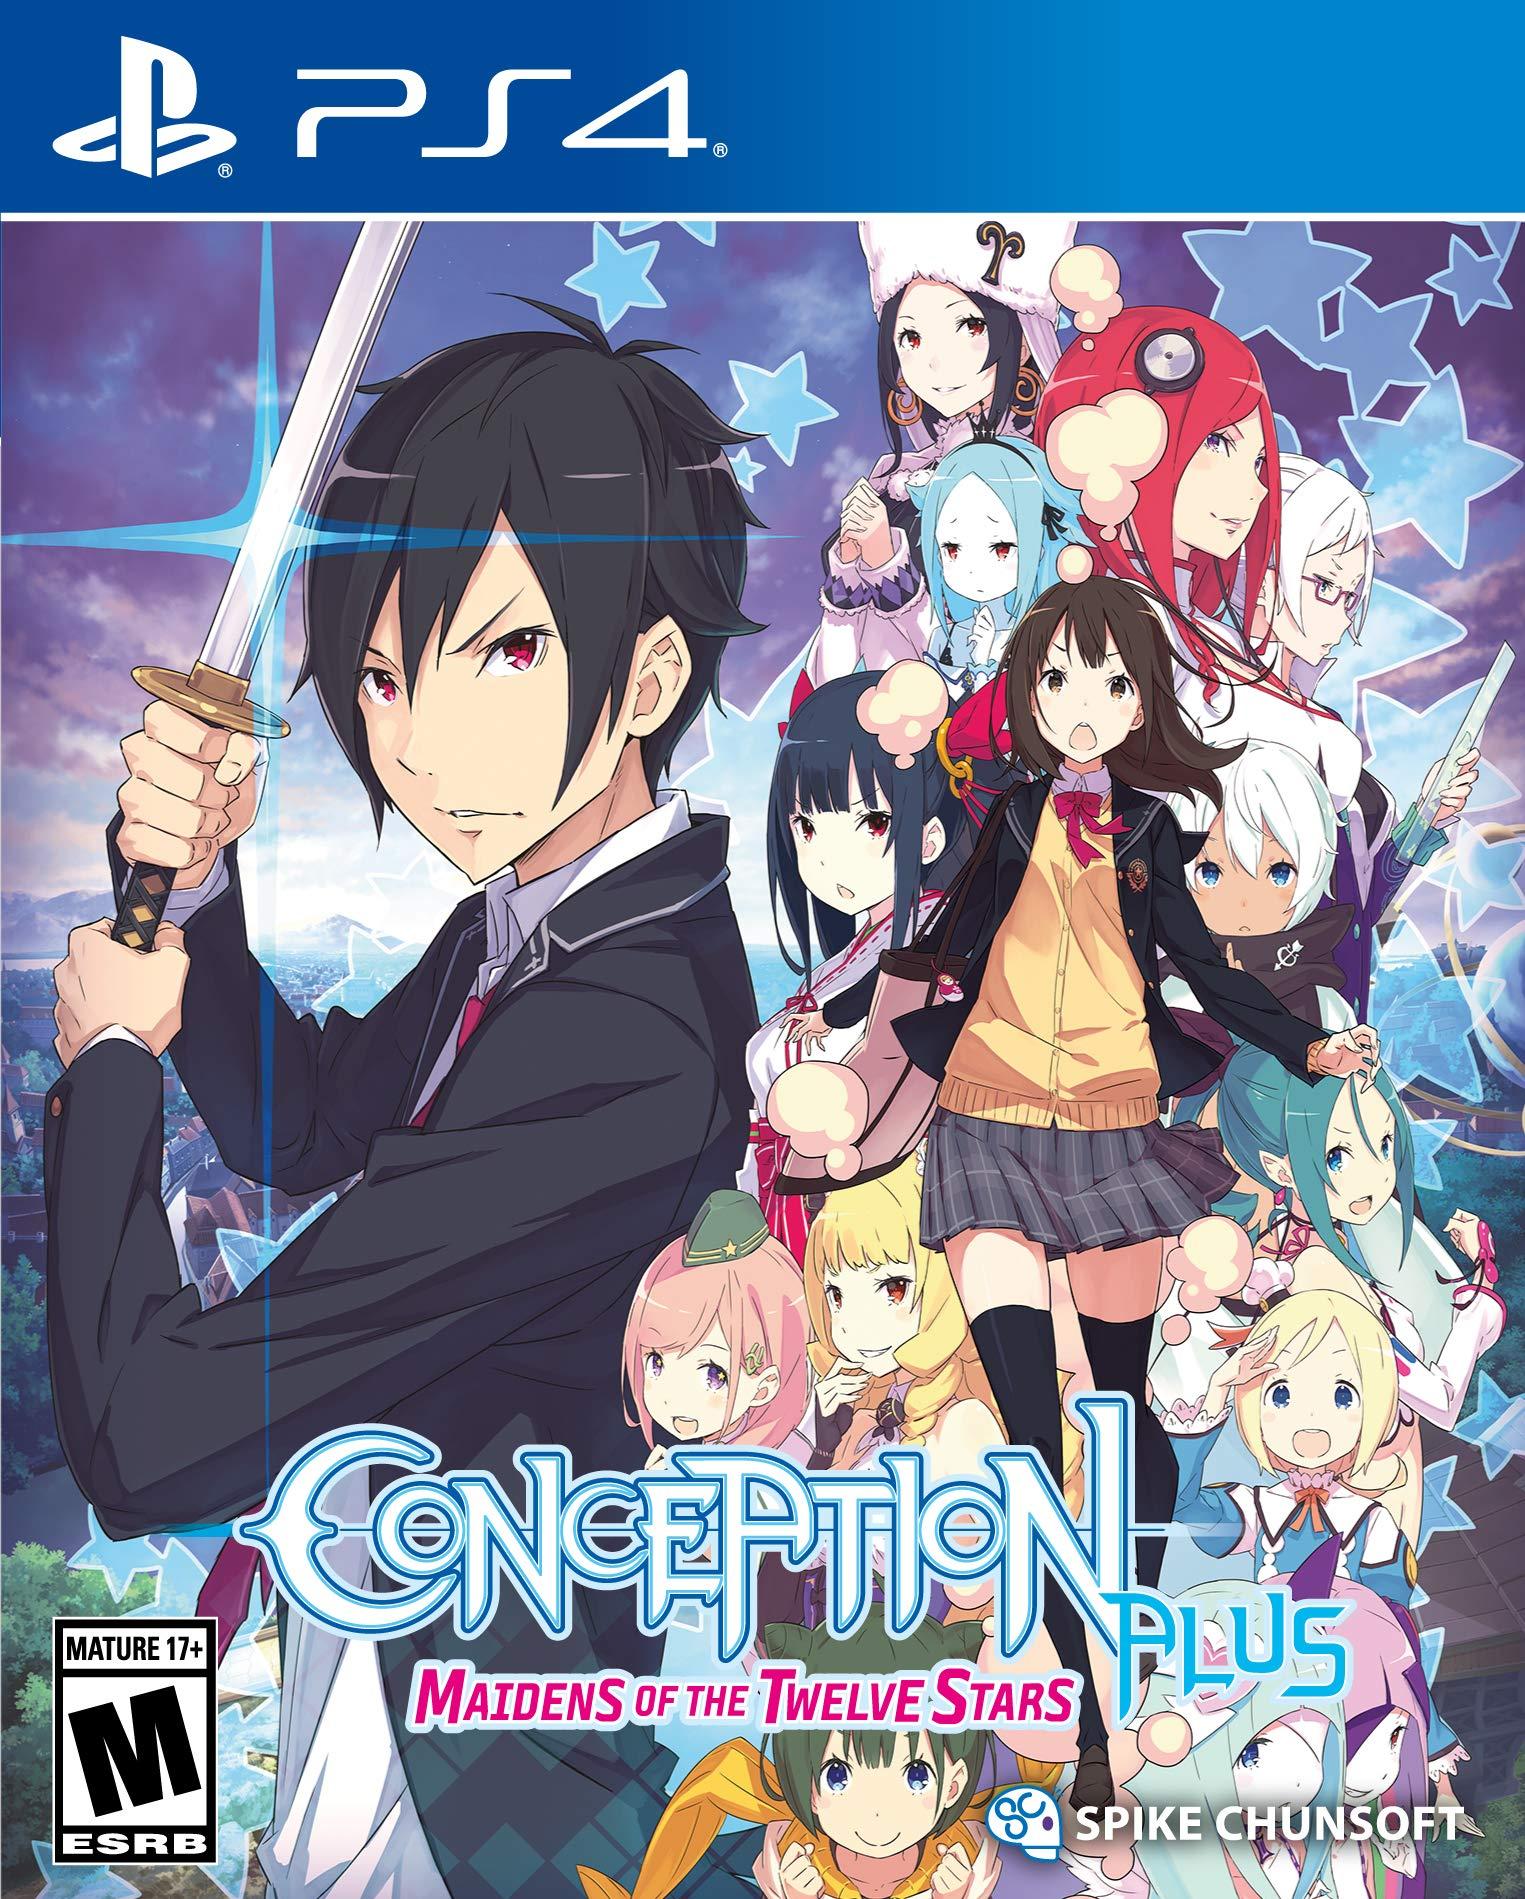 anime datovania online hry